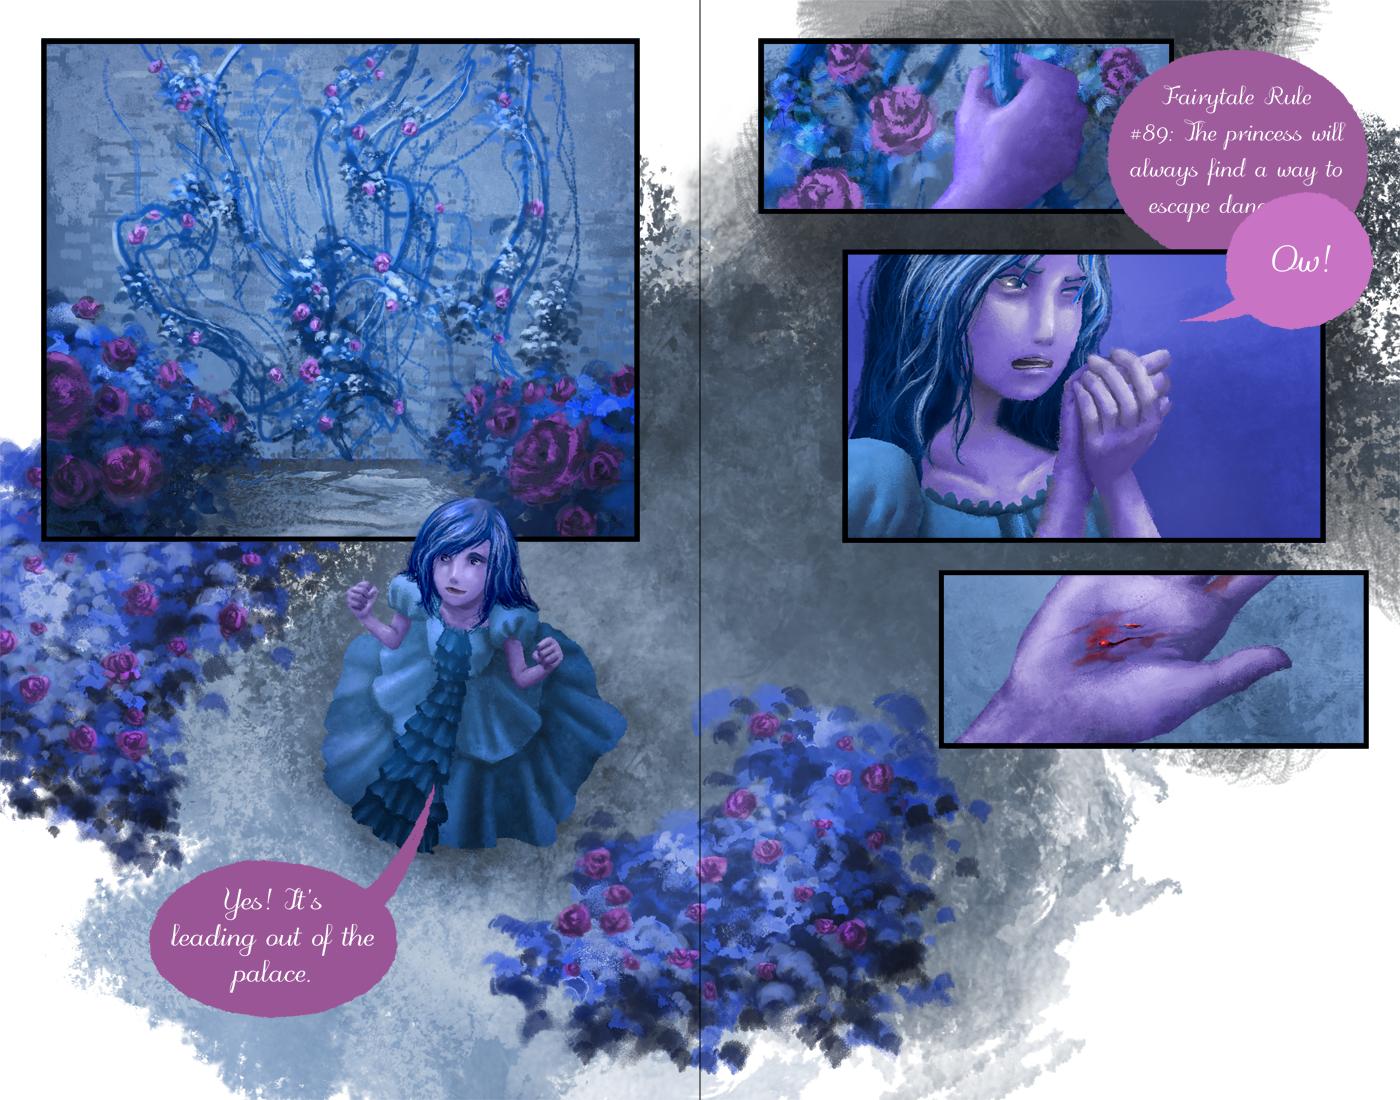 Fairytale Rule #89 by ebonysnowwhite